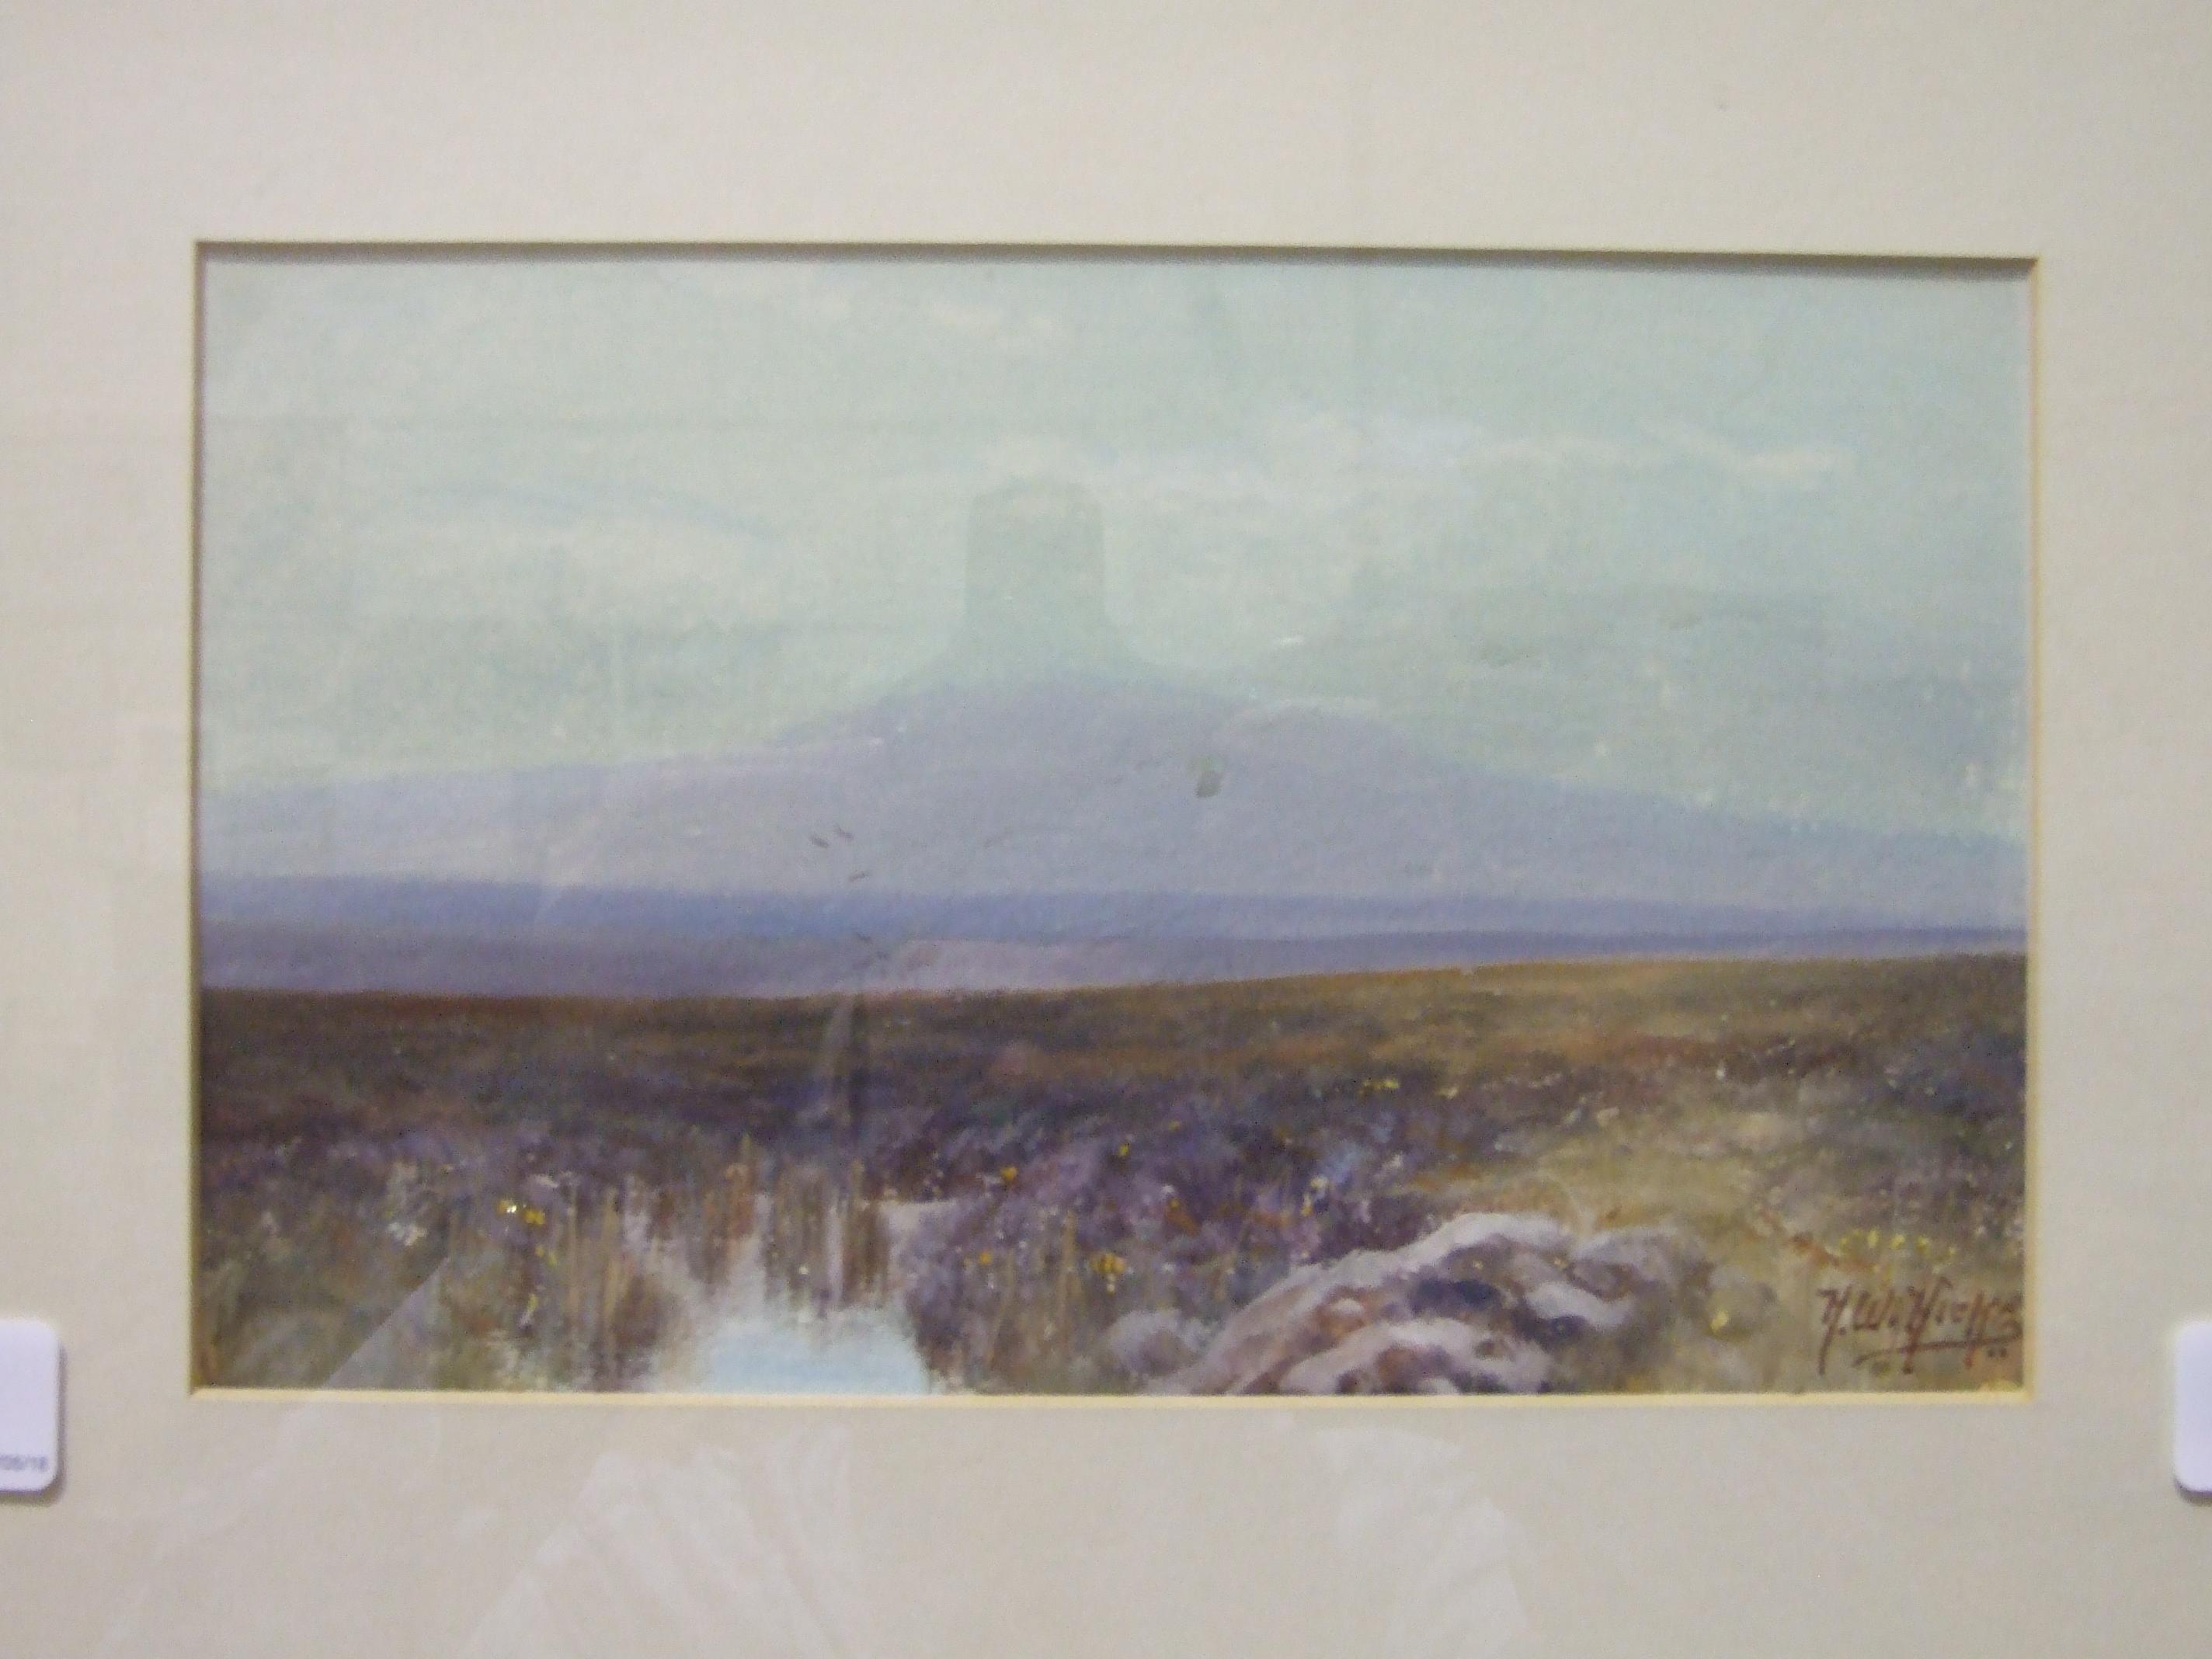 Herbert William Hicks (1880-1944) YES TOR, DARTMOOR Signed watercolour, 14.5 x 23cm.